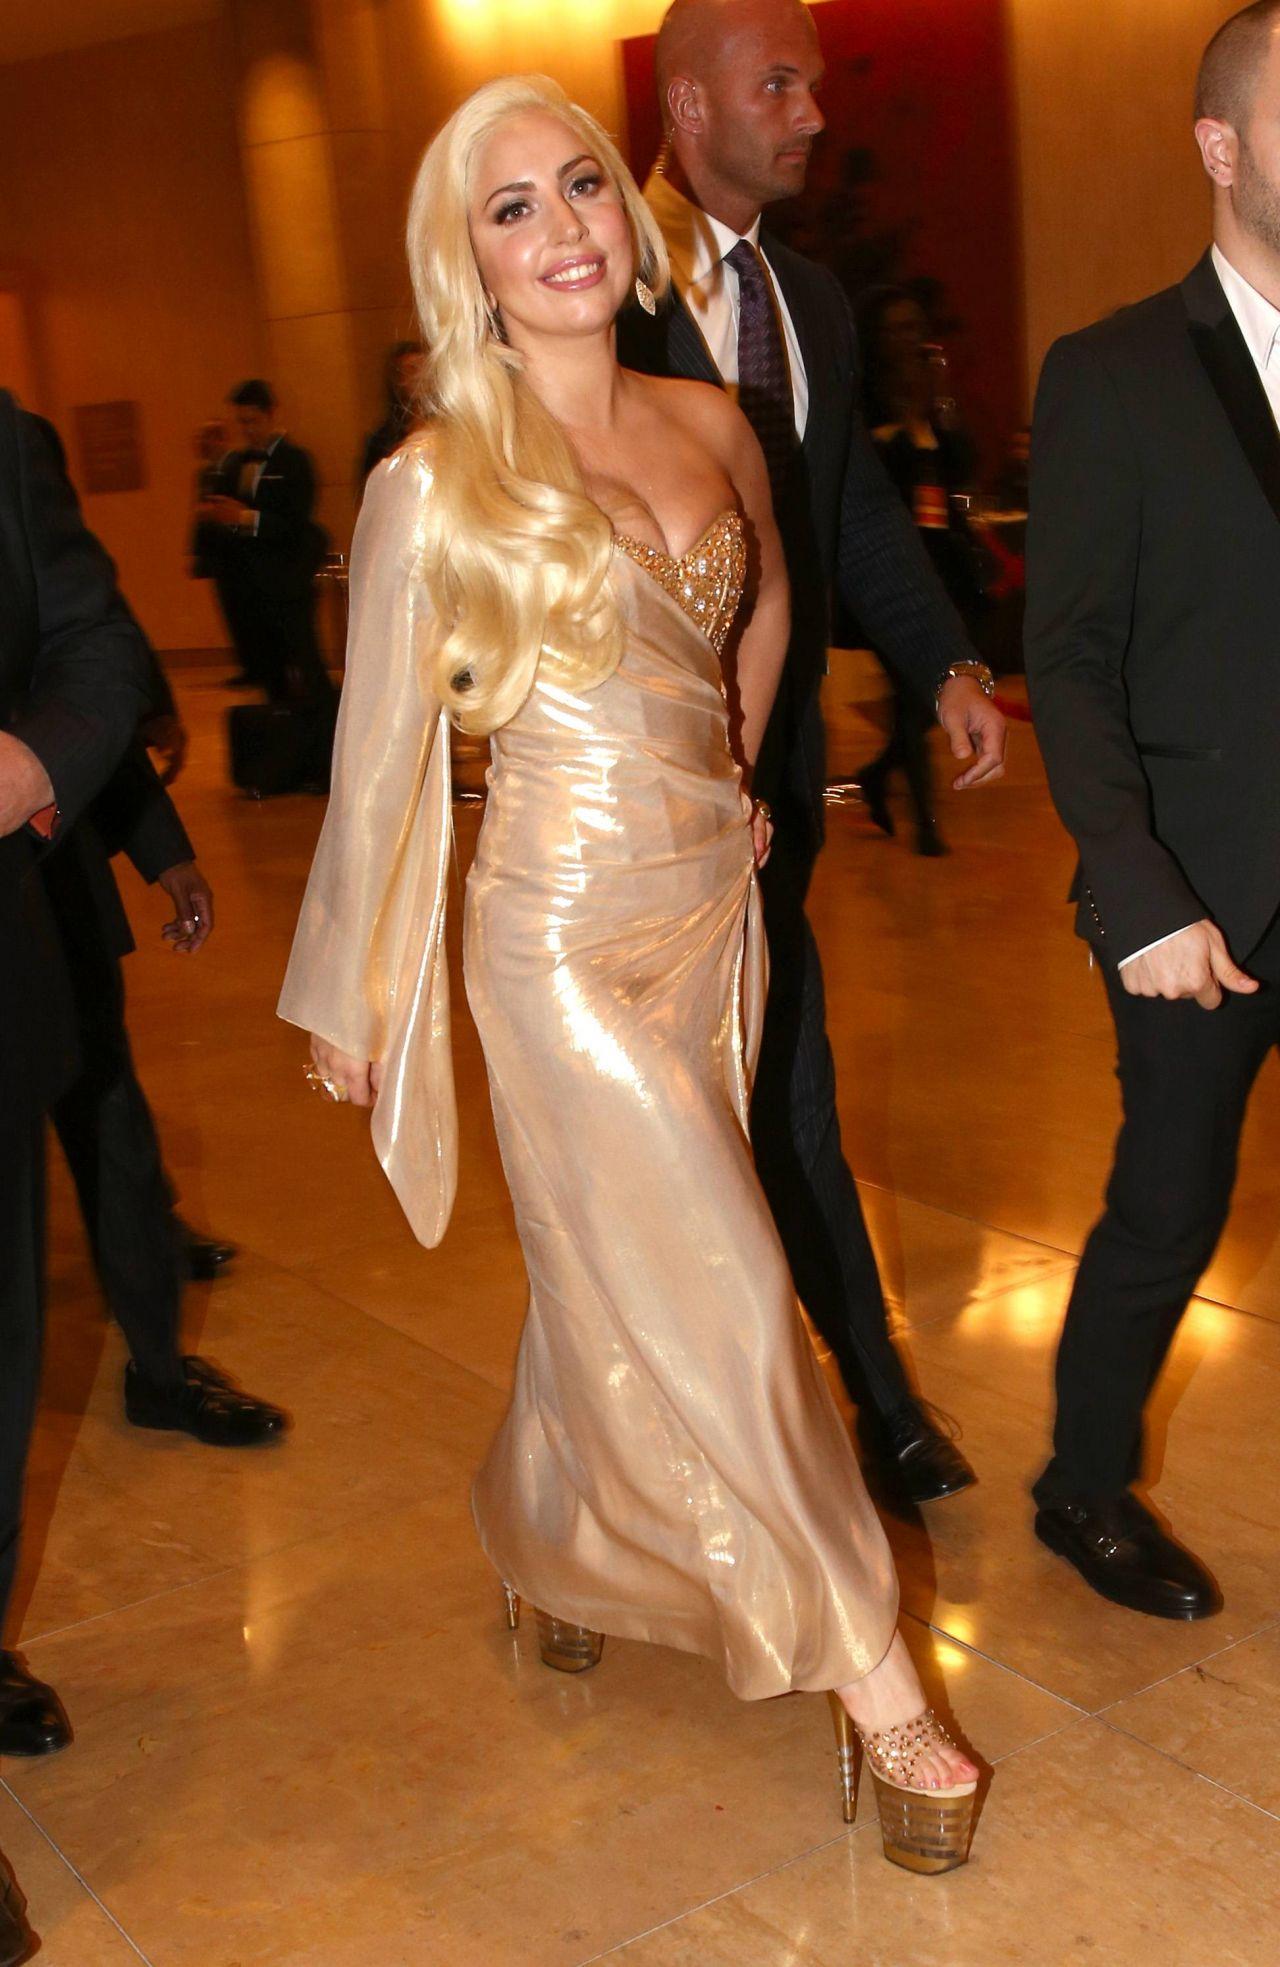 Lady Gaga Wears Perry Meek Bespoke Gold Dress At 2014